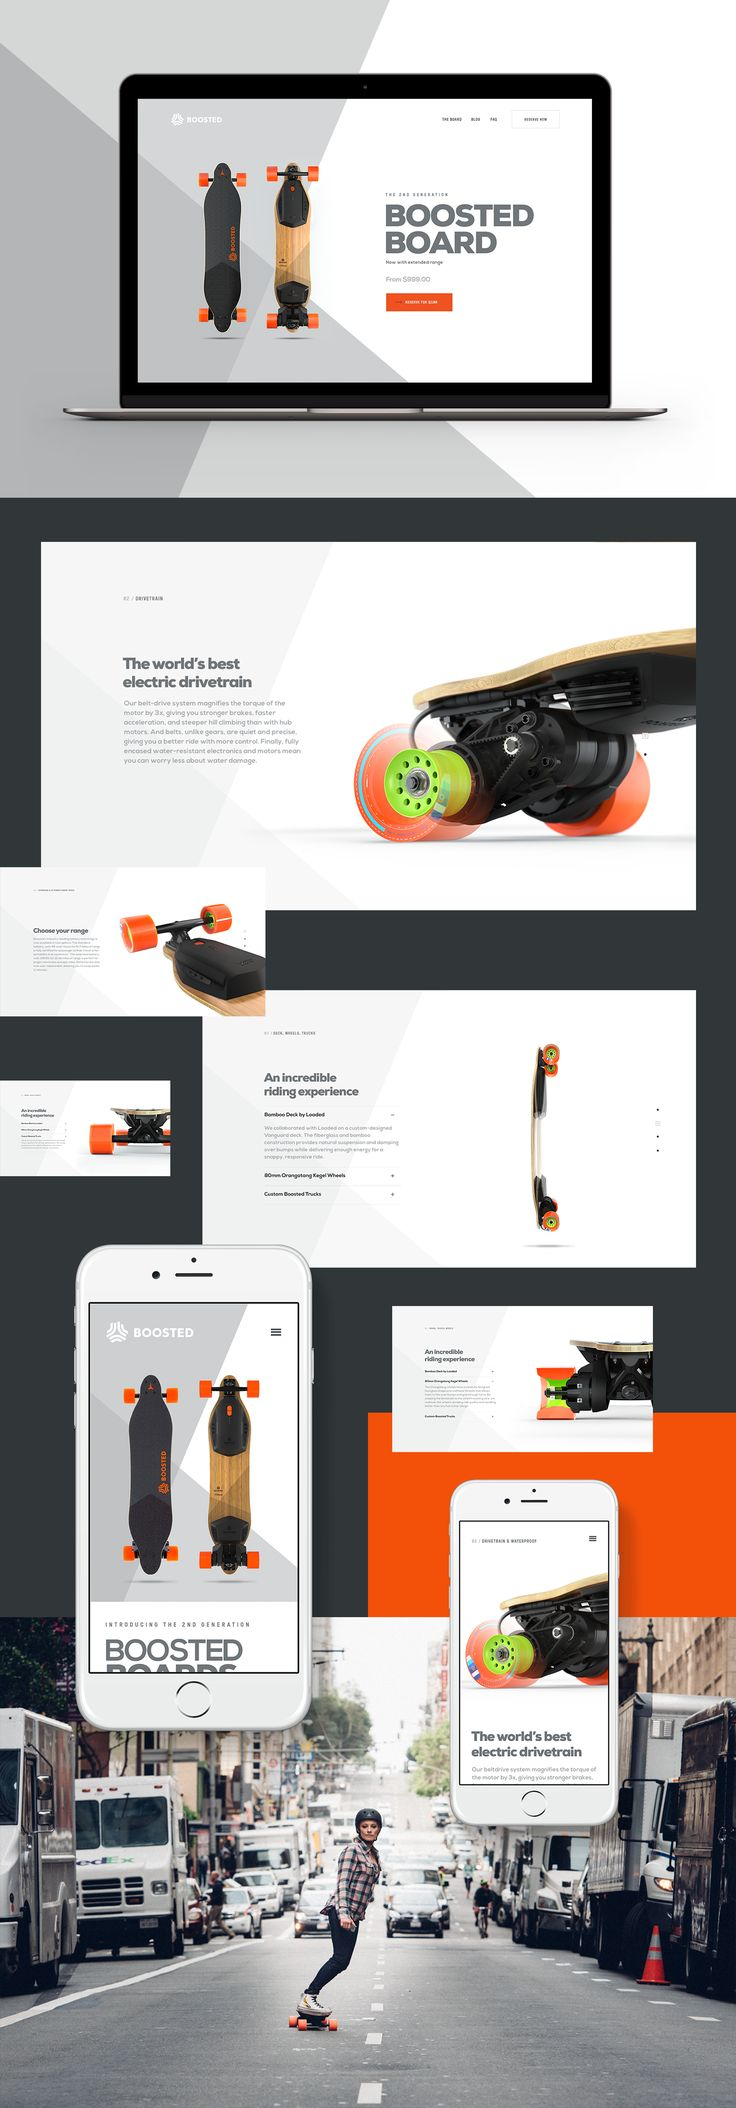 Boosted Board Web Site | Abduzeedo Design Inspiration